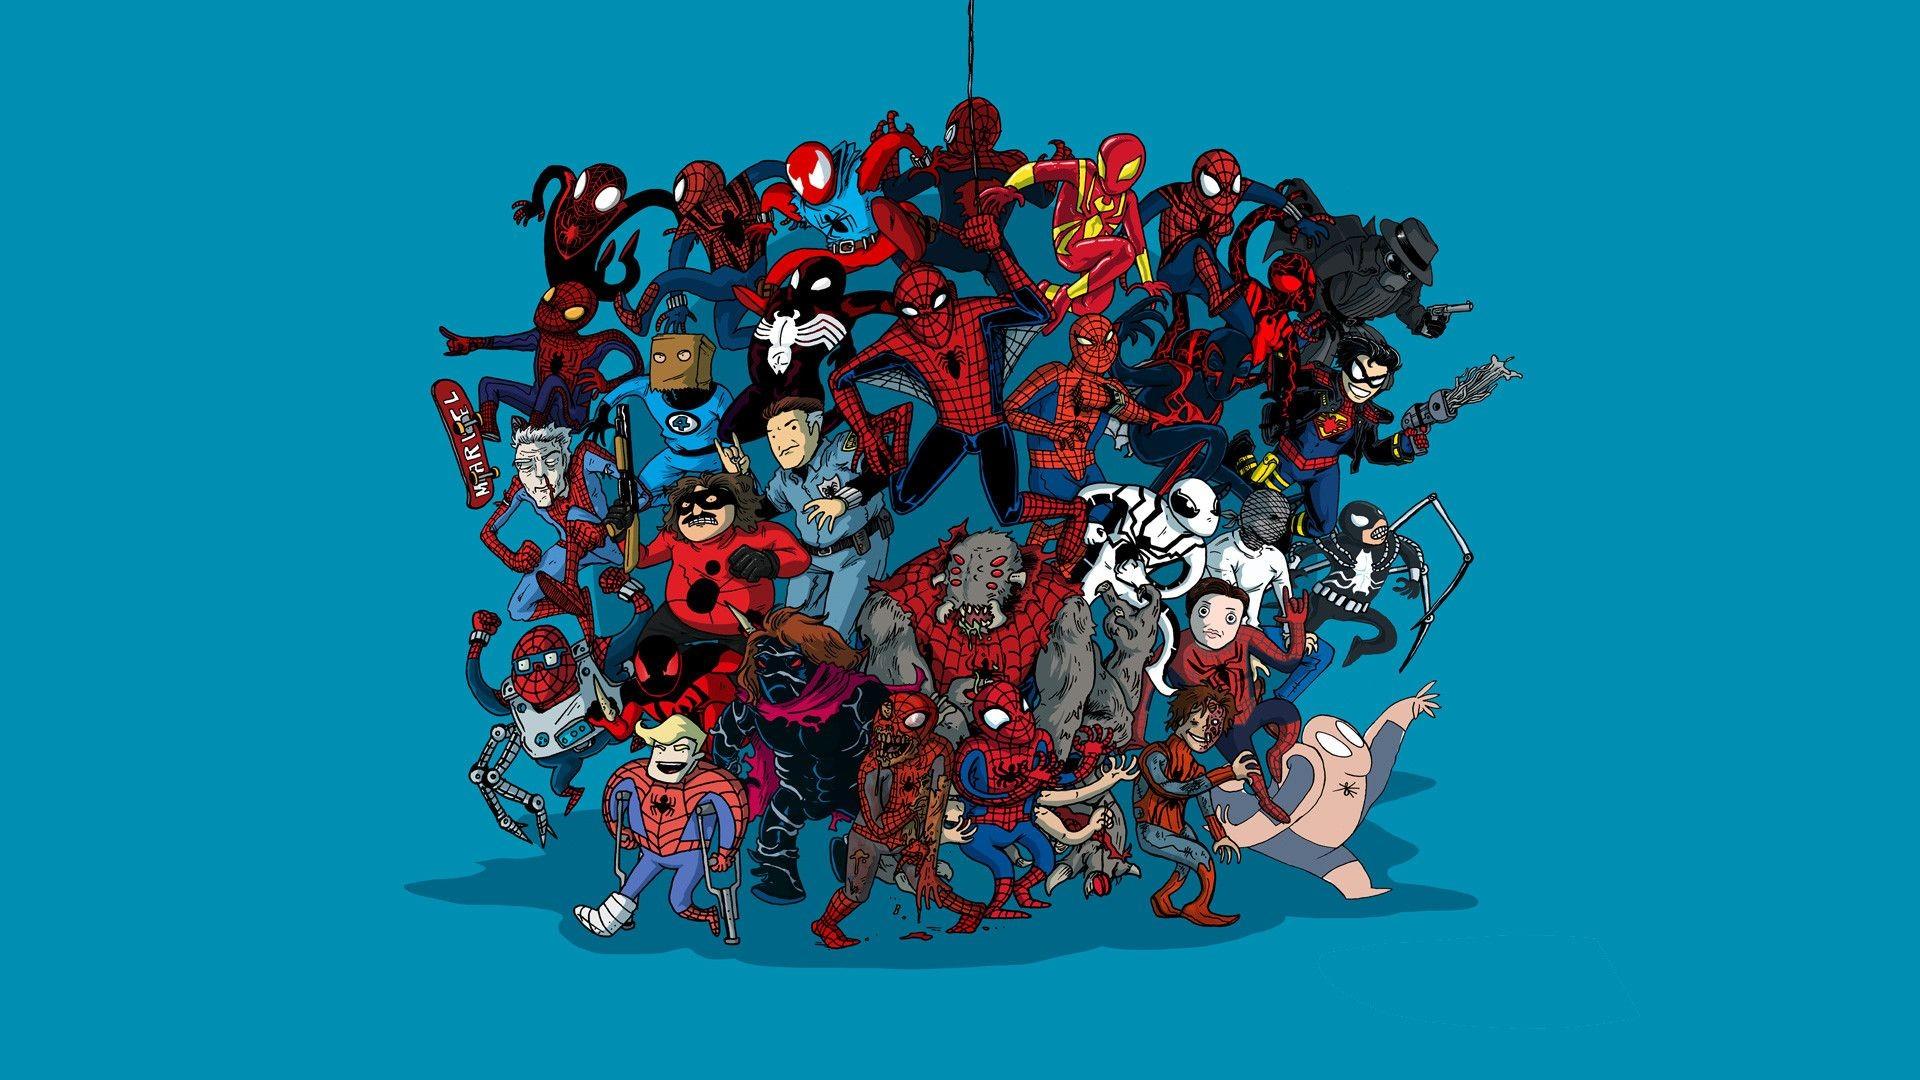 Spider Man Wallpapers Spiderman Wallpaper Hd 1080p - Desktop Spiderman Wallpaper Hd - HD Wallpaper